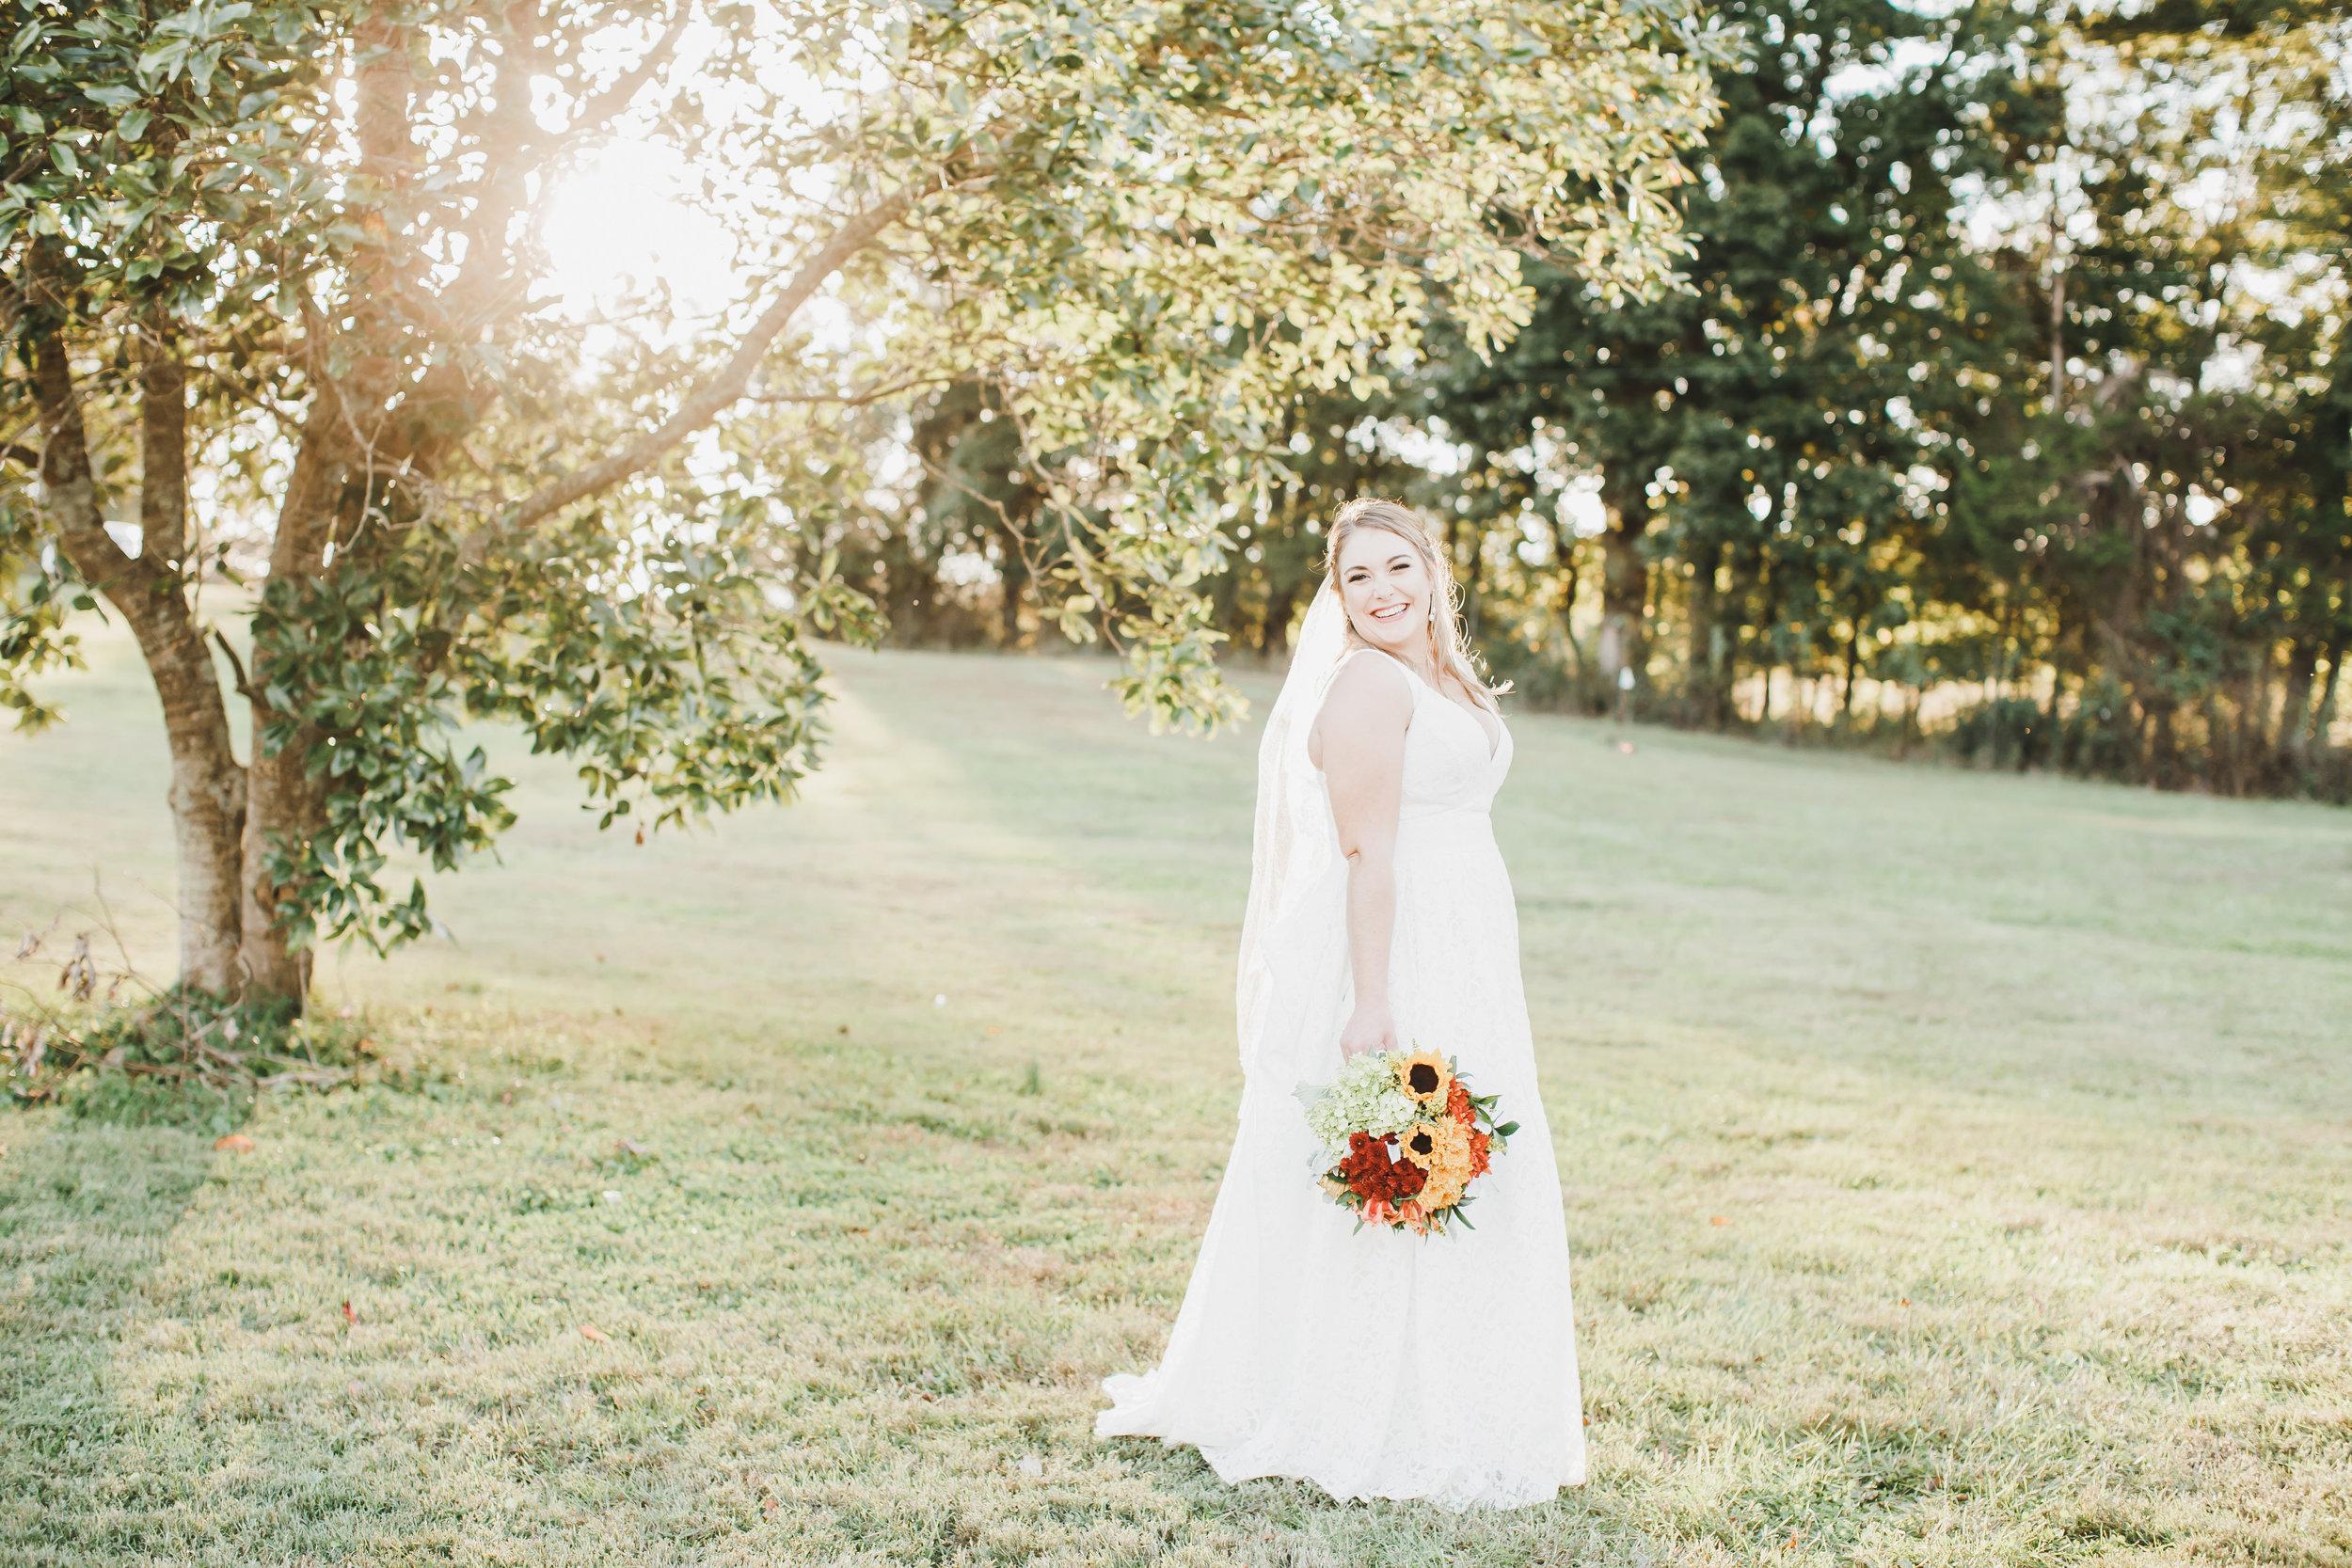 Fling - Virginia Wedding Photographer - Photography by Amy Nicole-4567-9.jpg